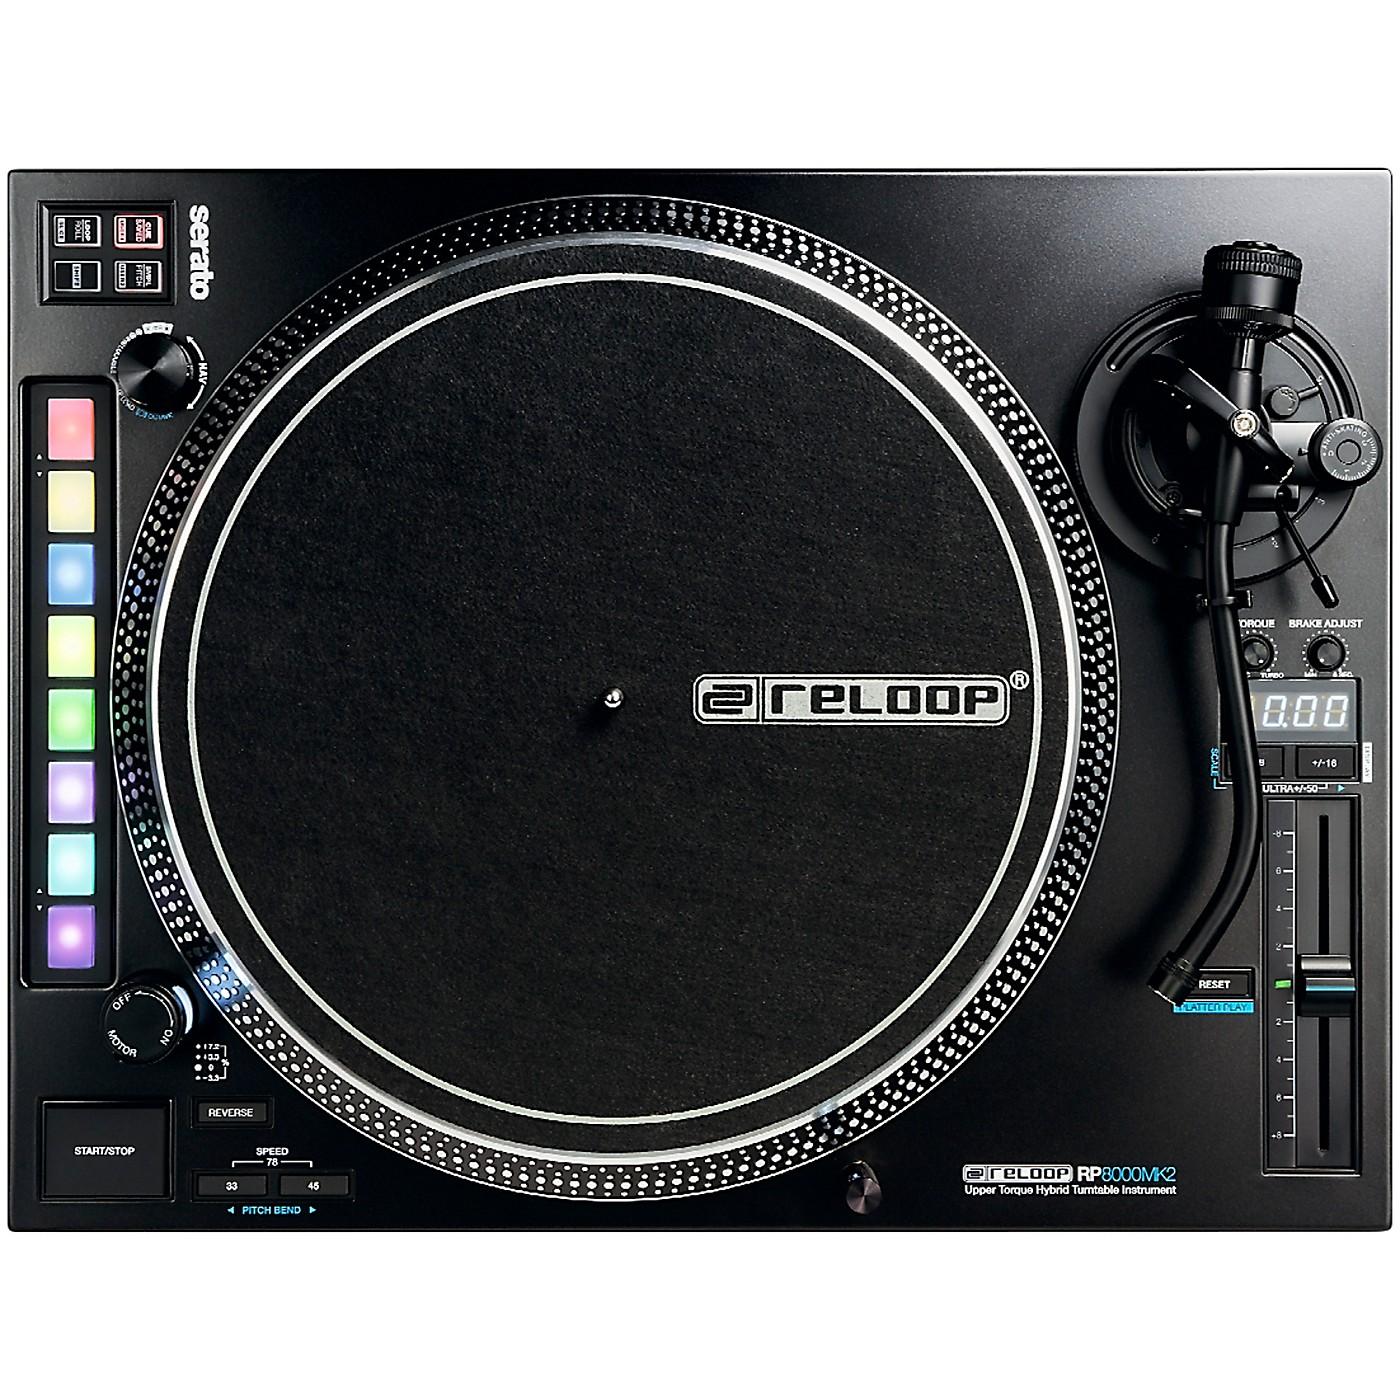 Reloop RP-8000 MK2 Professional DJ Turntable thumbnail